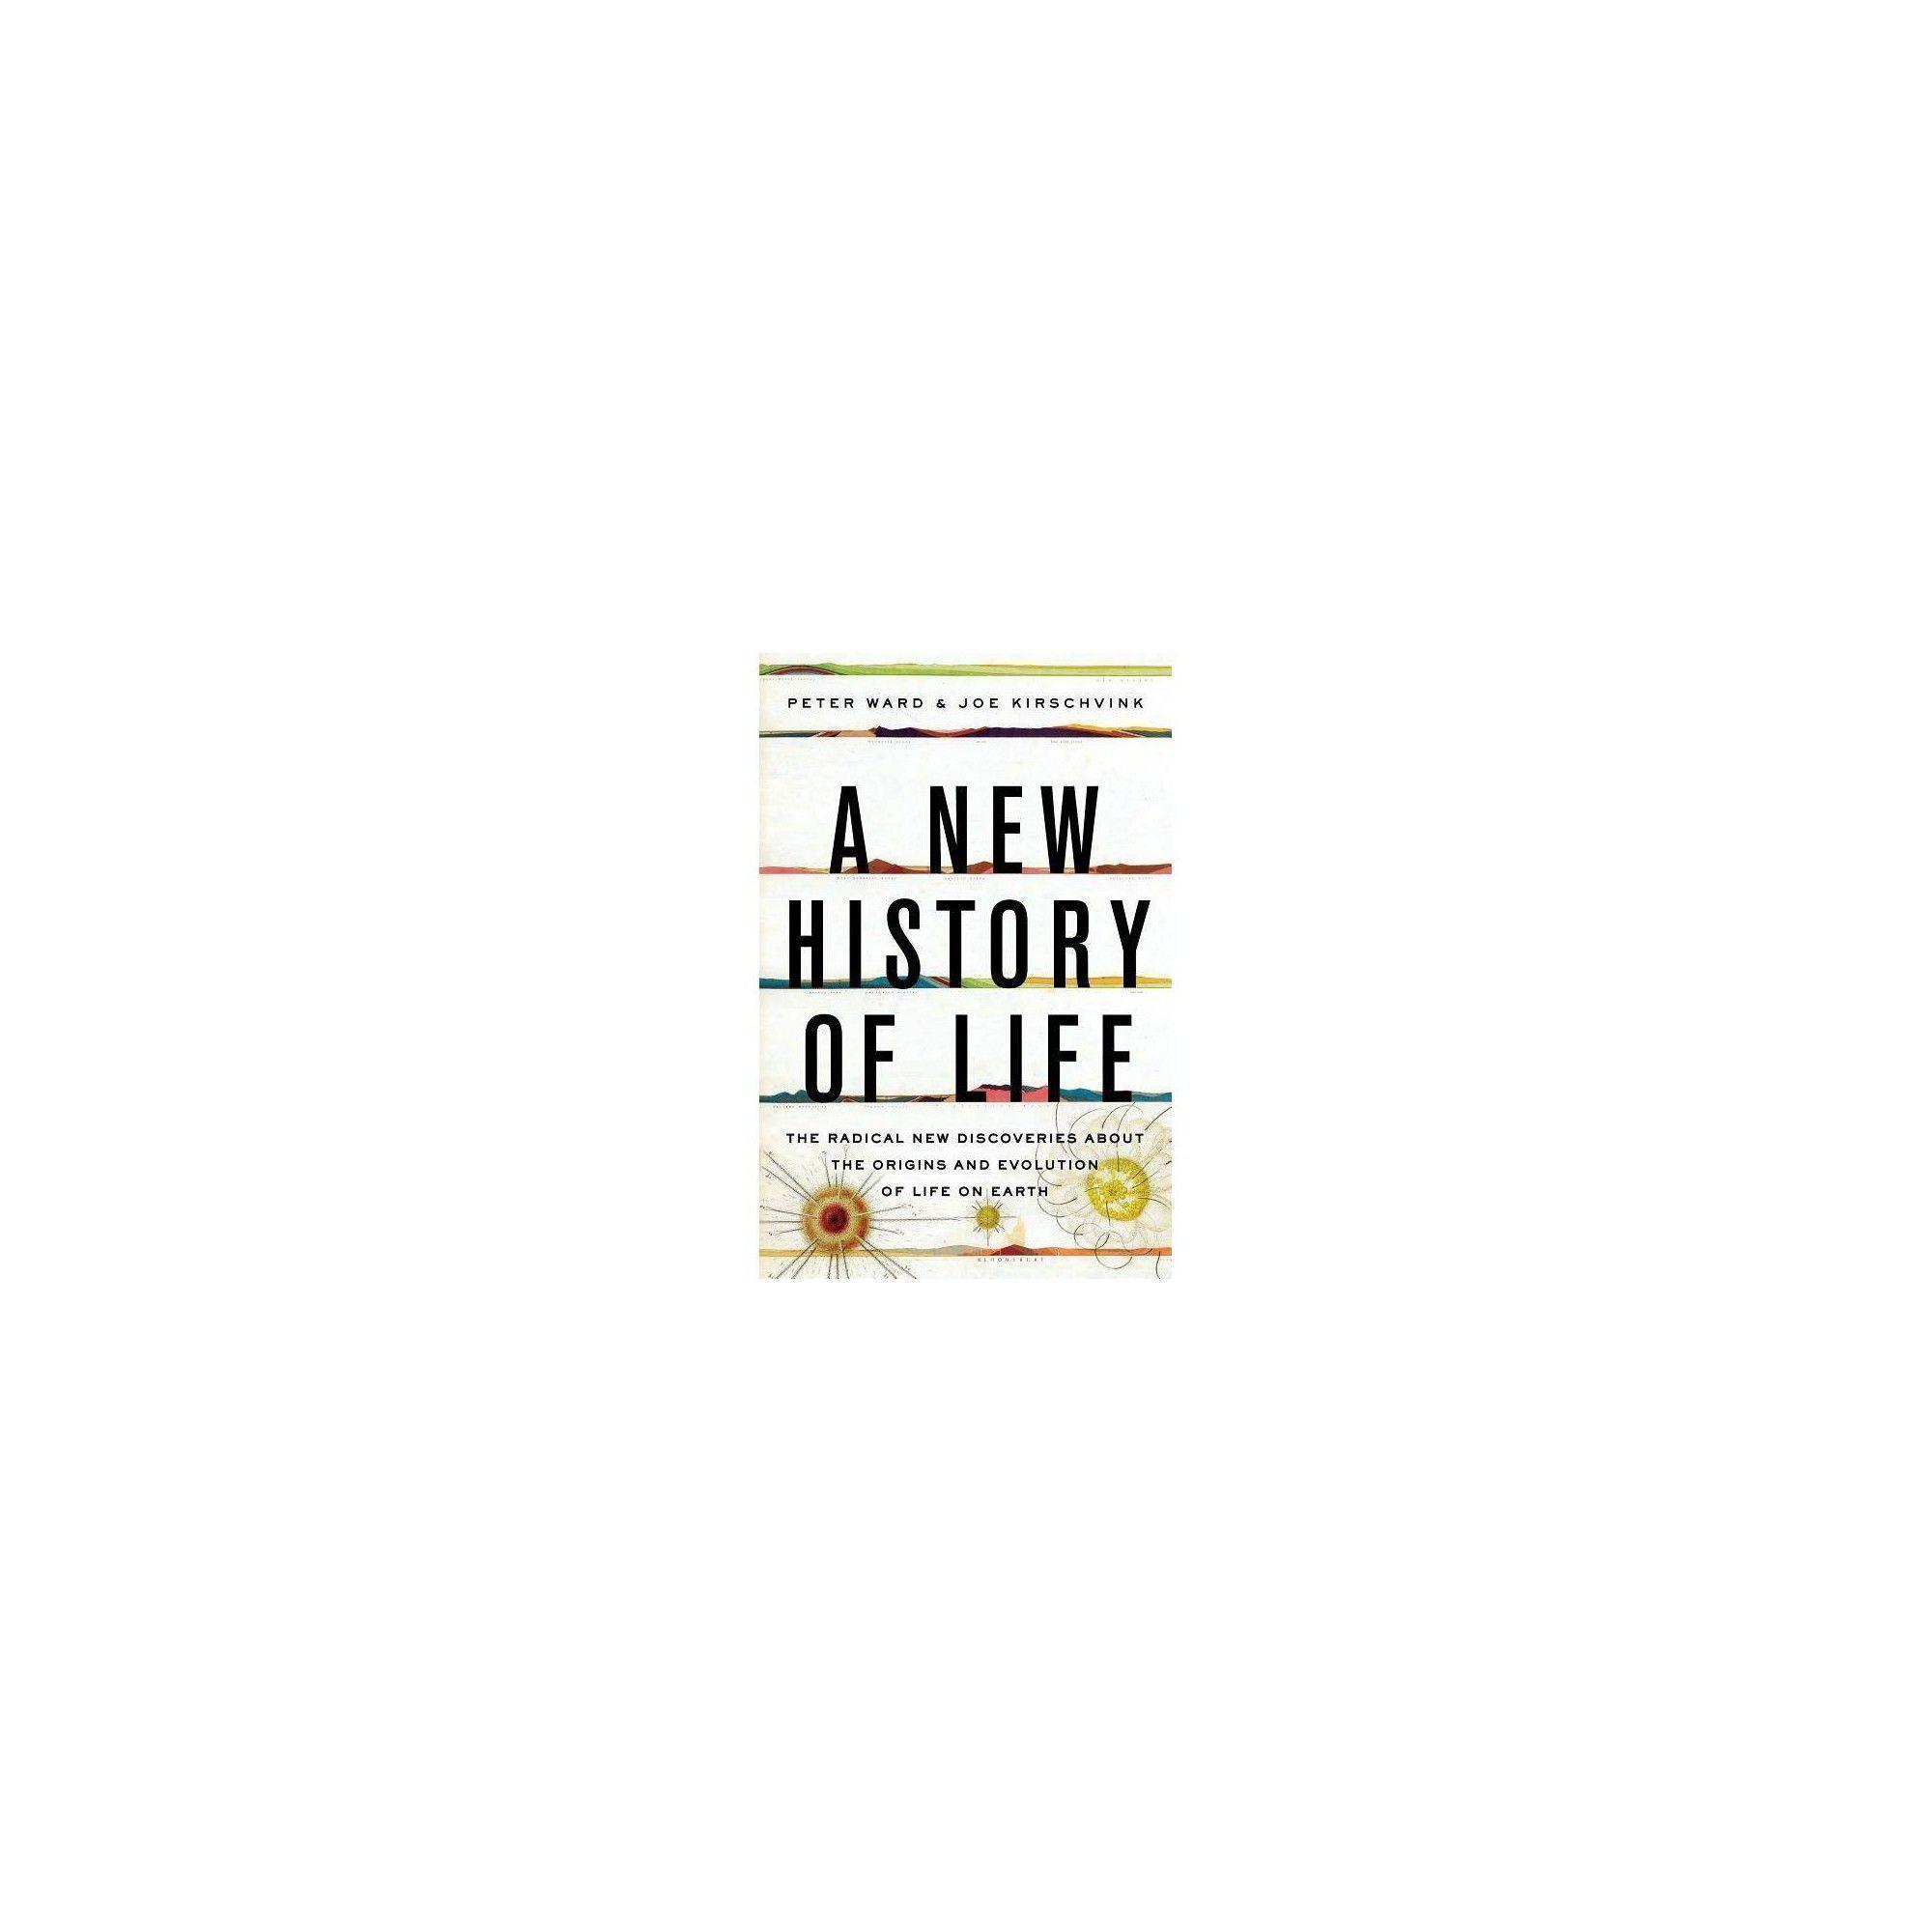 A New History of Life - by Peter Ward & Joe Kirschvink (Hardcover) #historyofdinosaurs A New History of Life - by Peter Ward & Joe Kirschvink (Hardcover) #historyofdinosaurs A New History of Life - by Peter Ward & Joe Kirschvink (Hardcover) #historyofdinosaurs A New History of Life - by Peter Ward & Joe Kirschvink (Hardcover) #historyofdinosaurs A New History of Life - by Peter Ward & Joe Kirschvink (Hardcover) #historyofdinosaurs A New History of Life - by Peter Ward & Joe Kirschvink (Hardcover #historyofdinosaurs